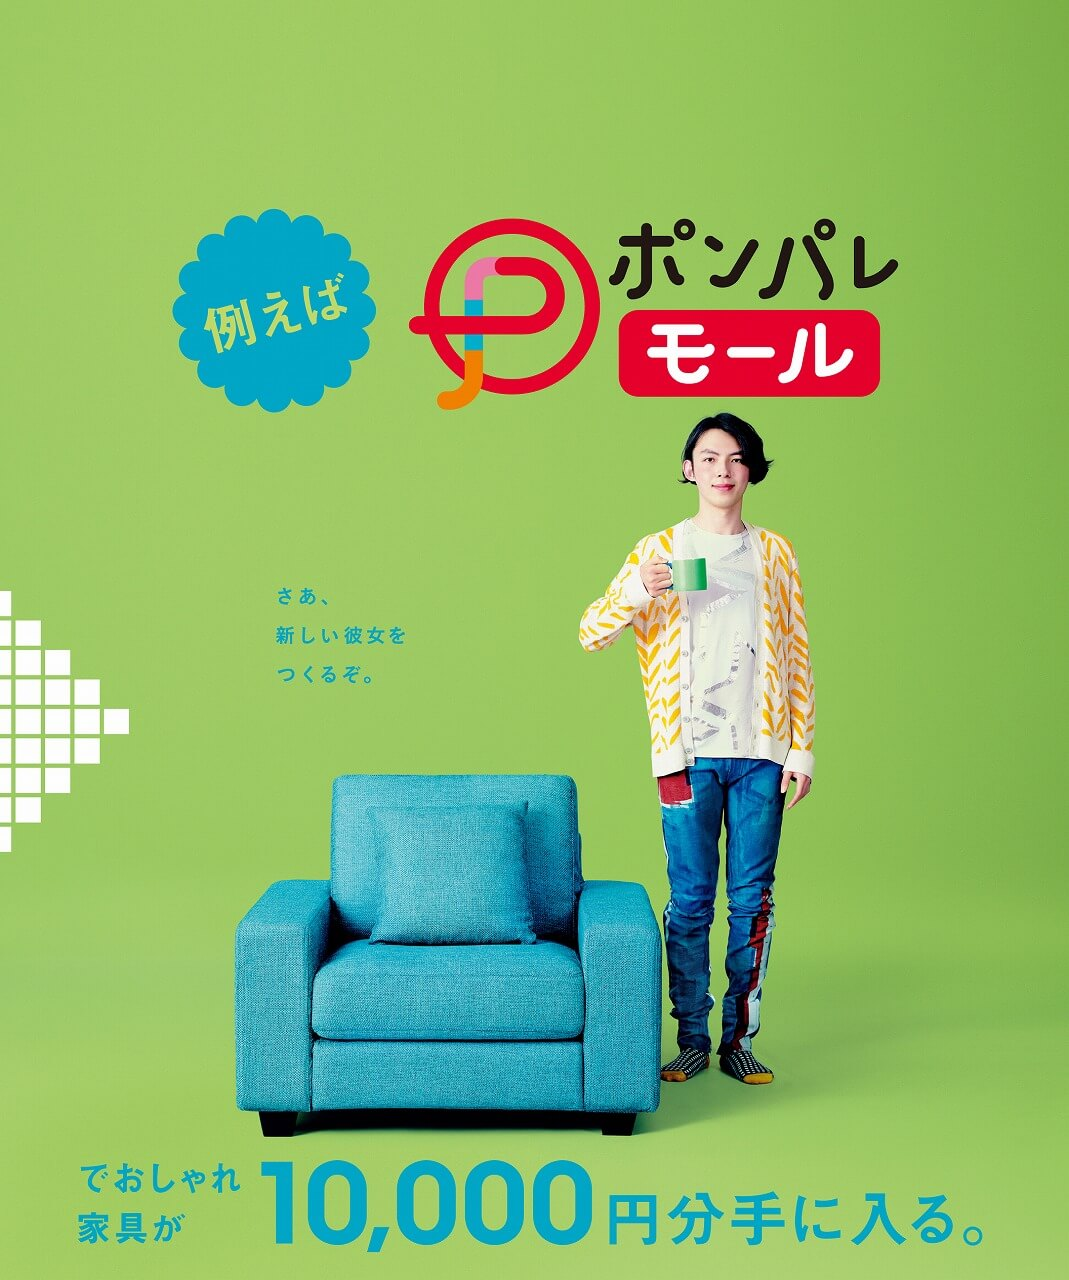 YAMATO<span>/ B-TOKYO</span>